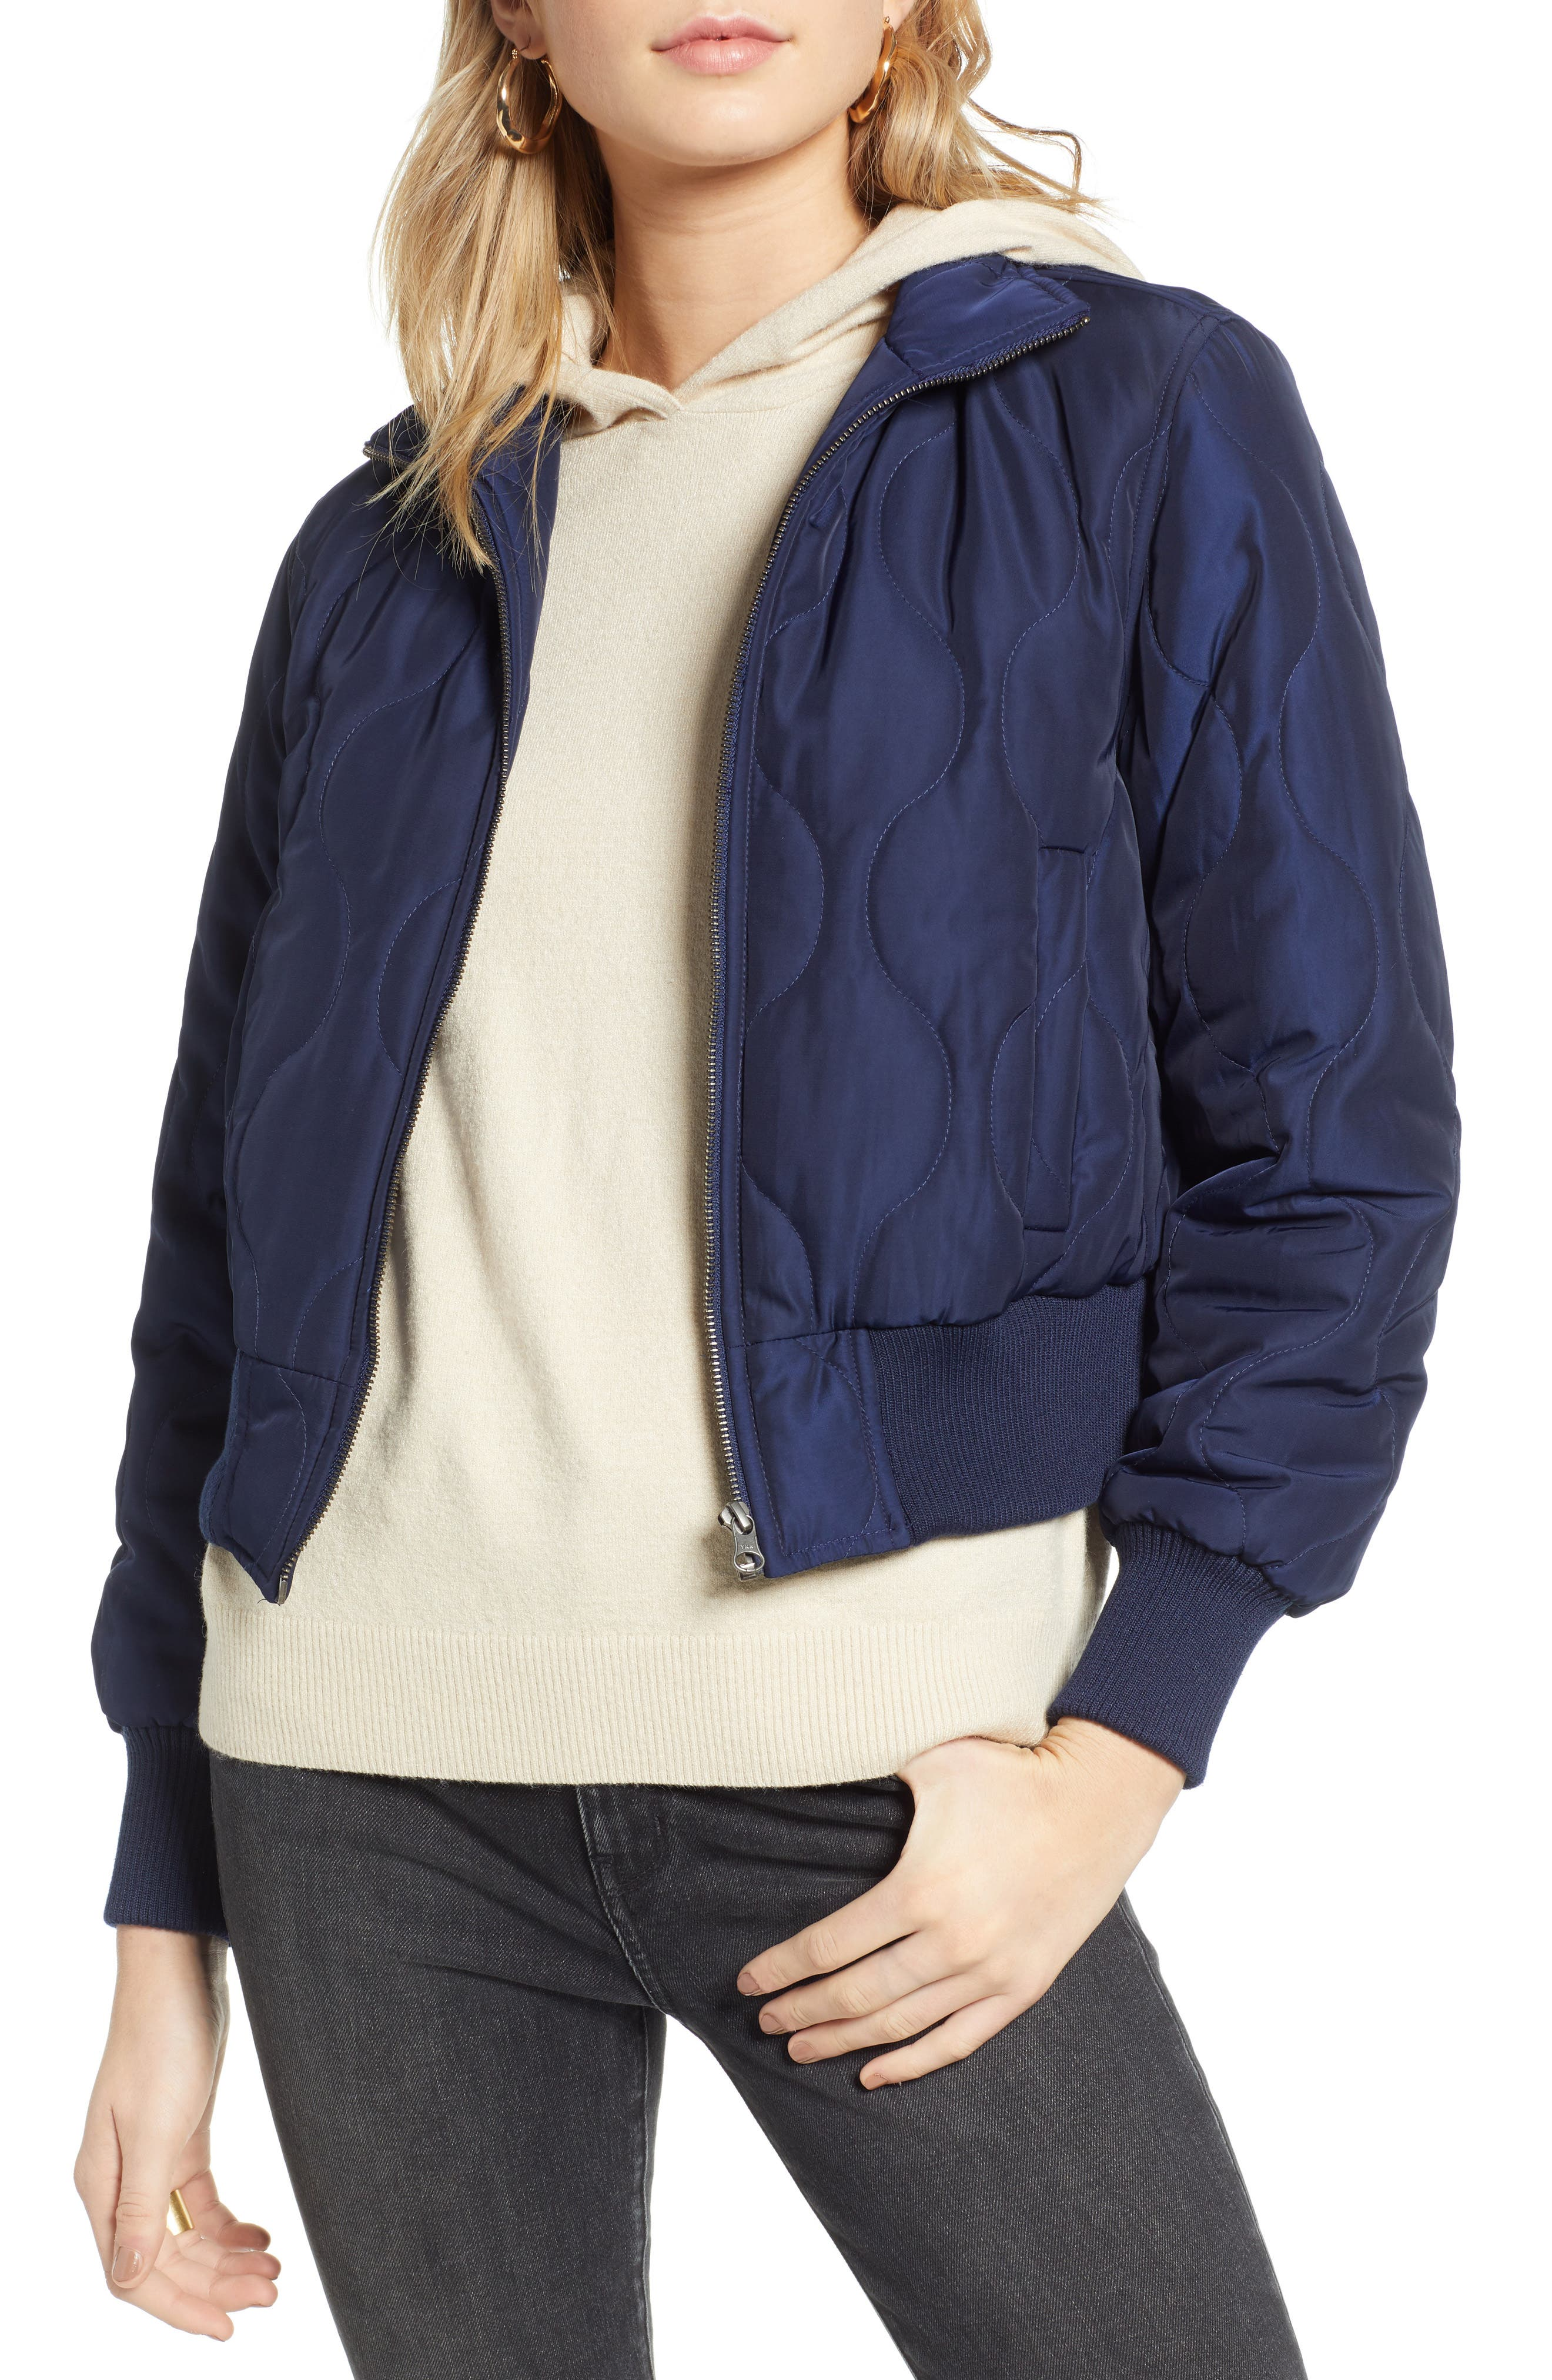 TREASURE & BOND, Satin Crop Puffer Jacket, Main thumbnail 1, color, NAVY MARITIME